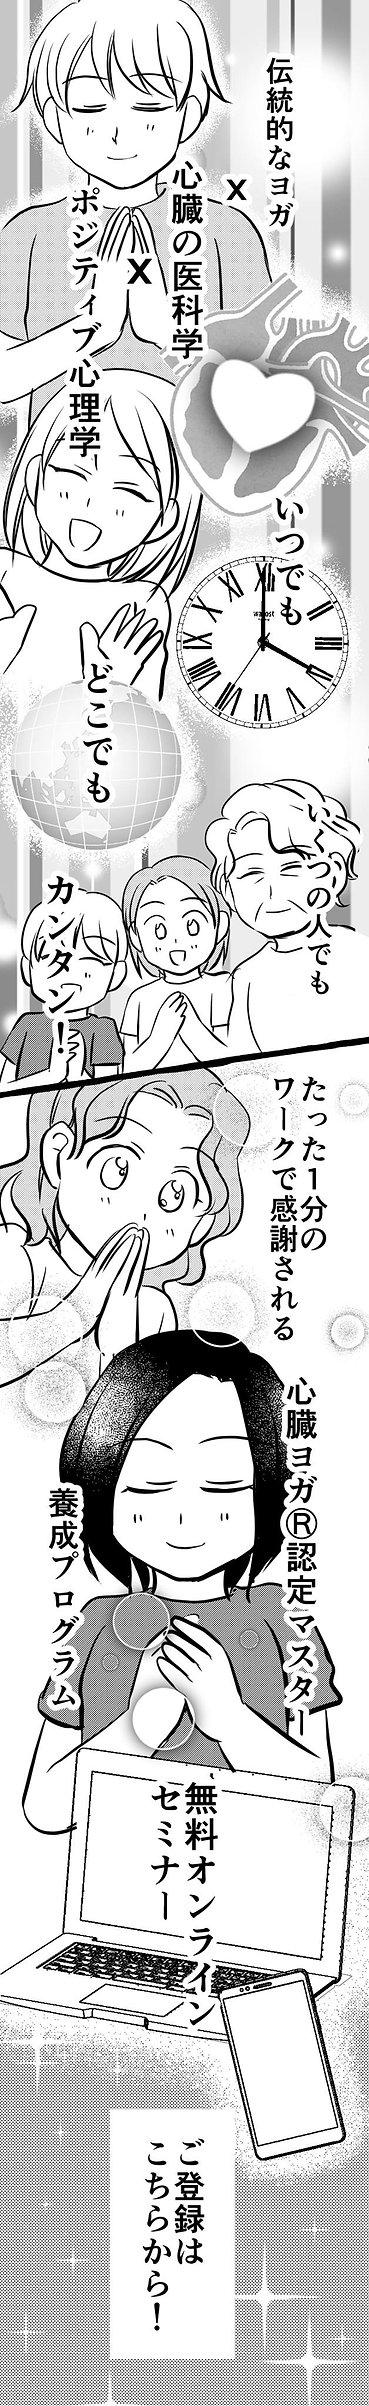 HY_PR_manga_LP_2019_05_ヨガ_心臓_ポジ.jpg